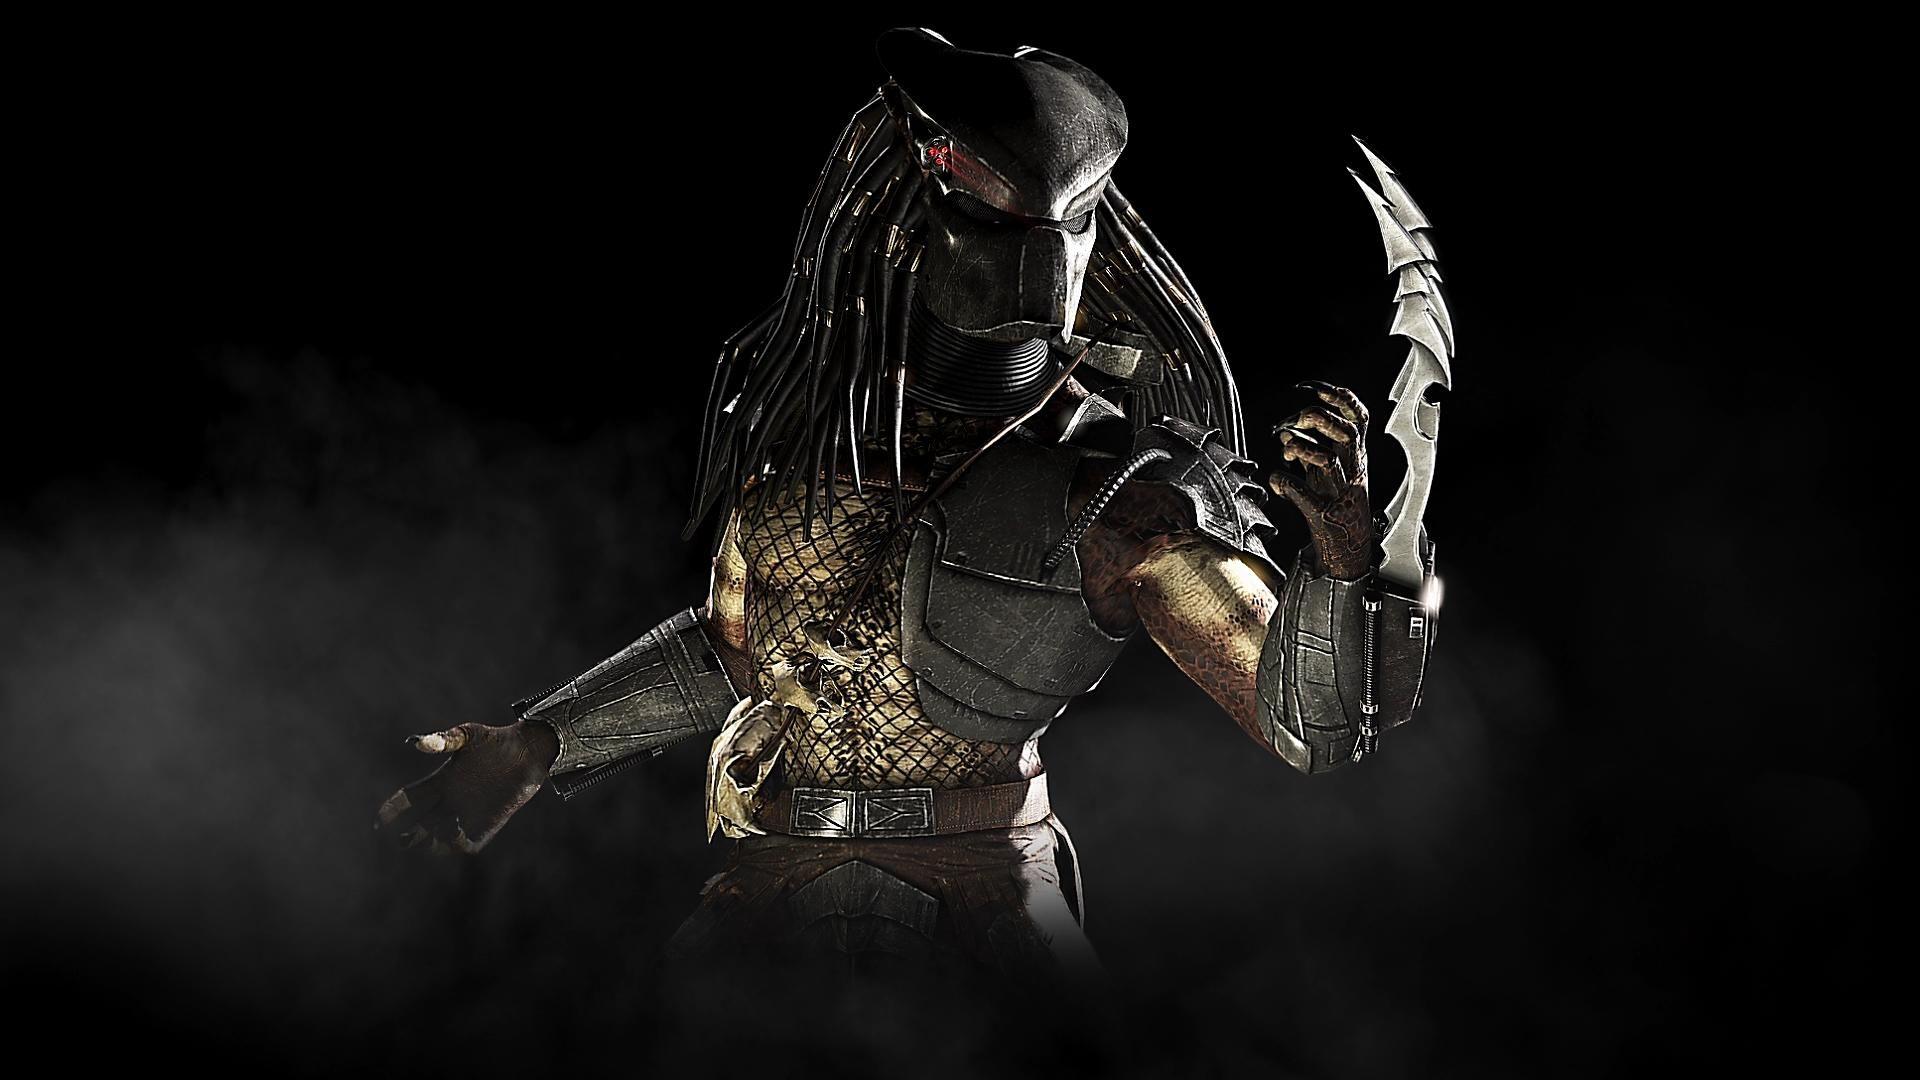 Wallpaper MORTAL KOMBAT X Scorpion Fighting PS Xbox One